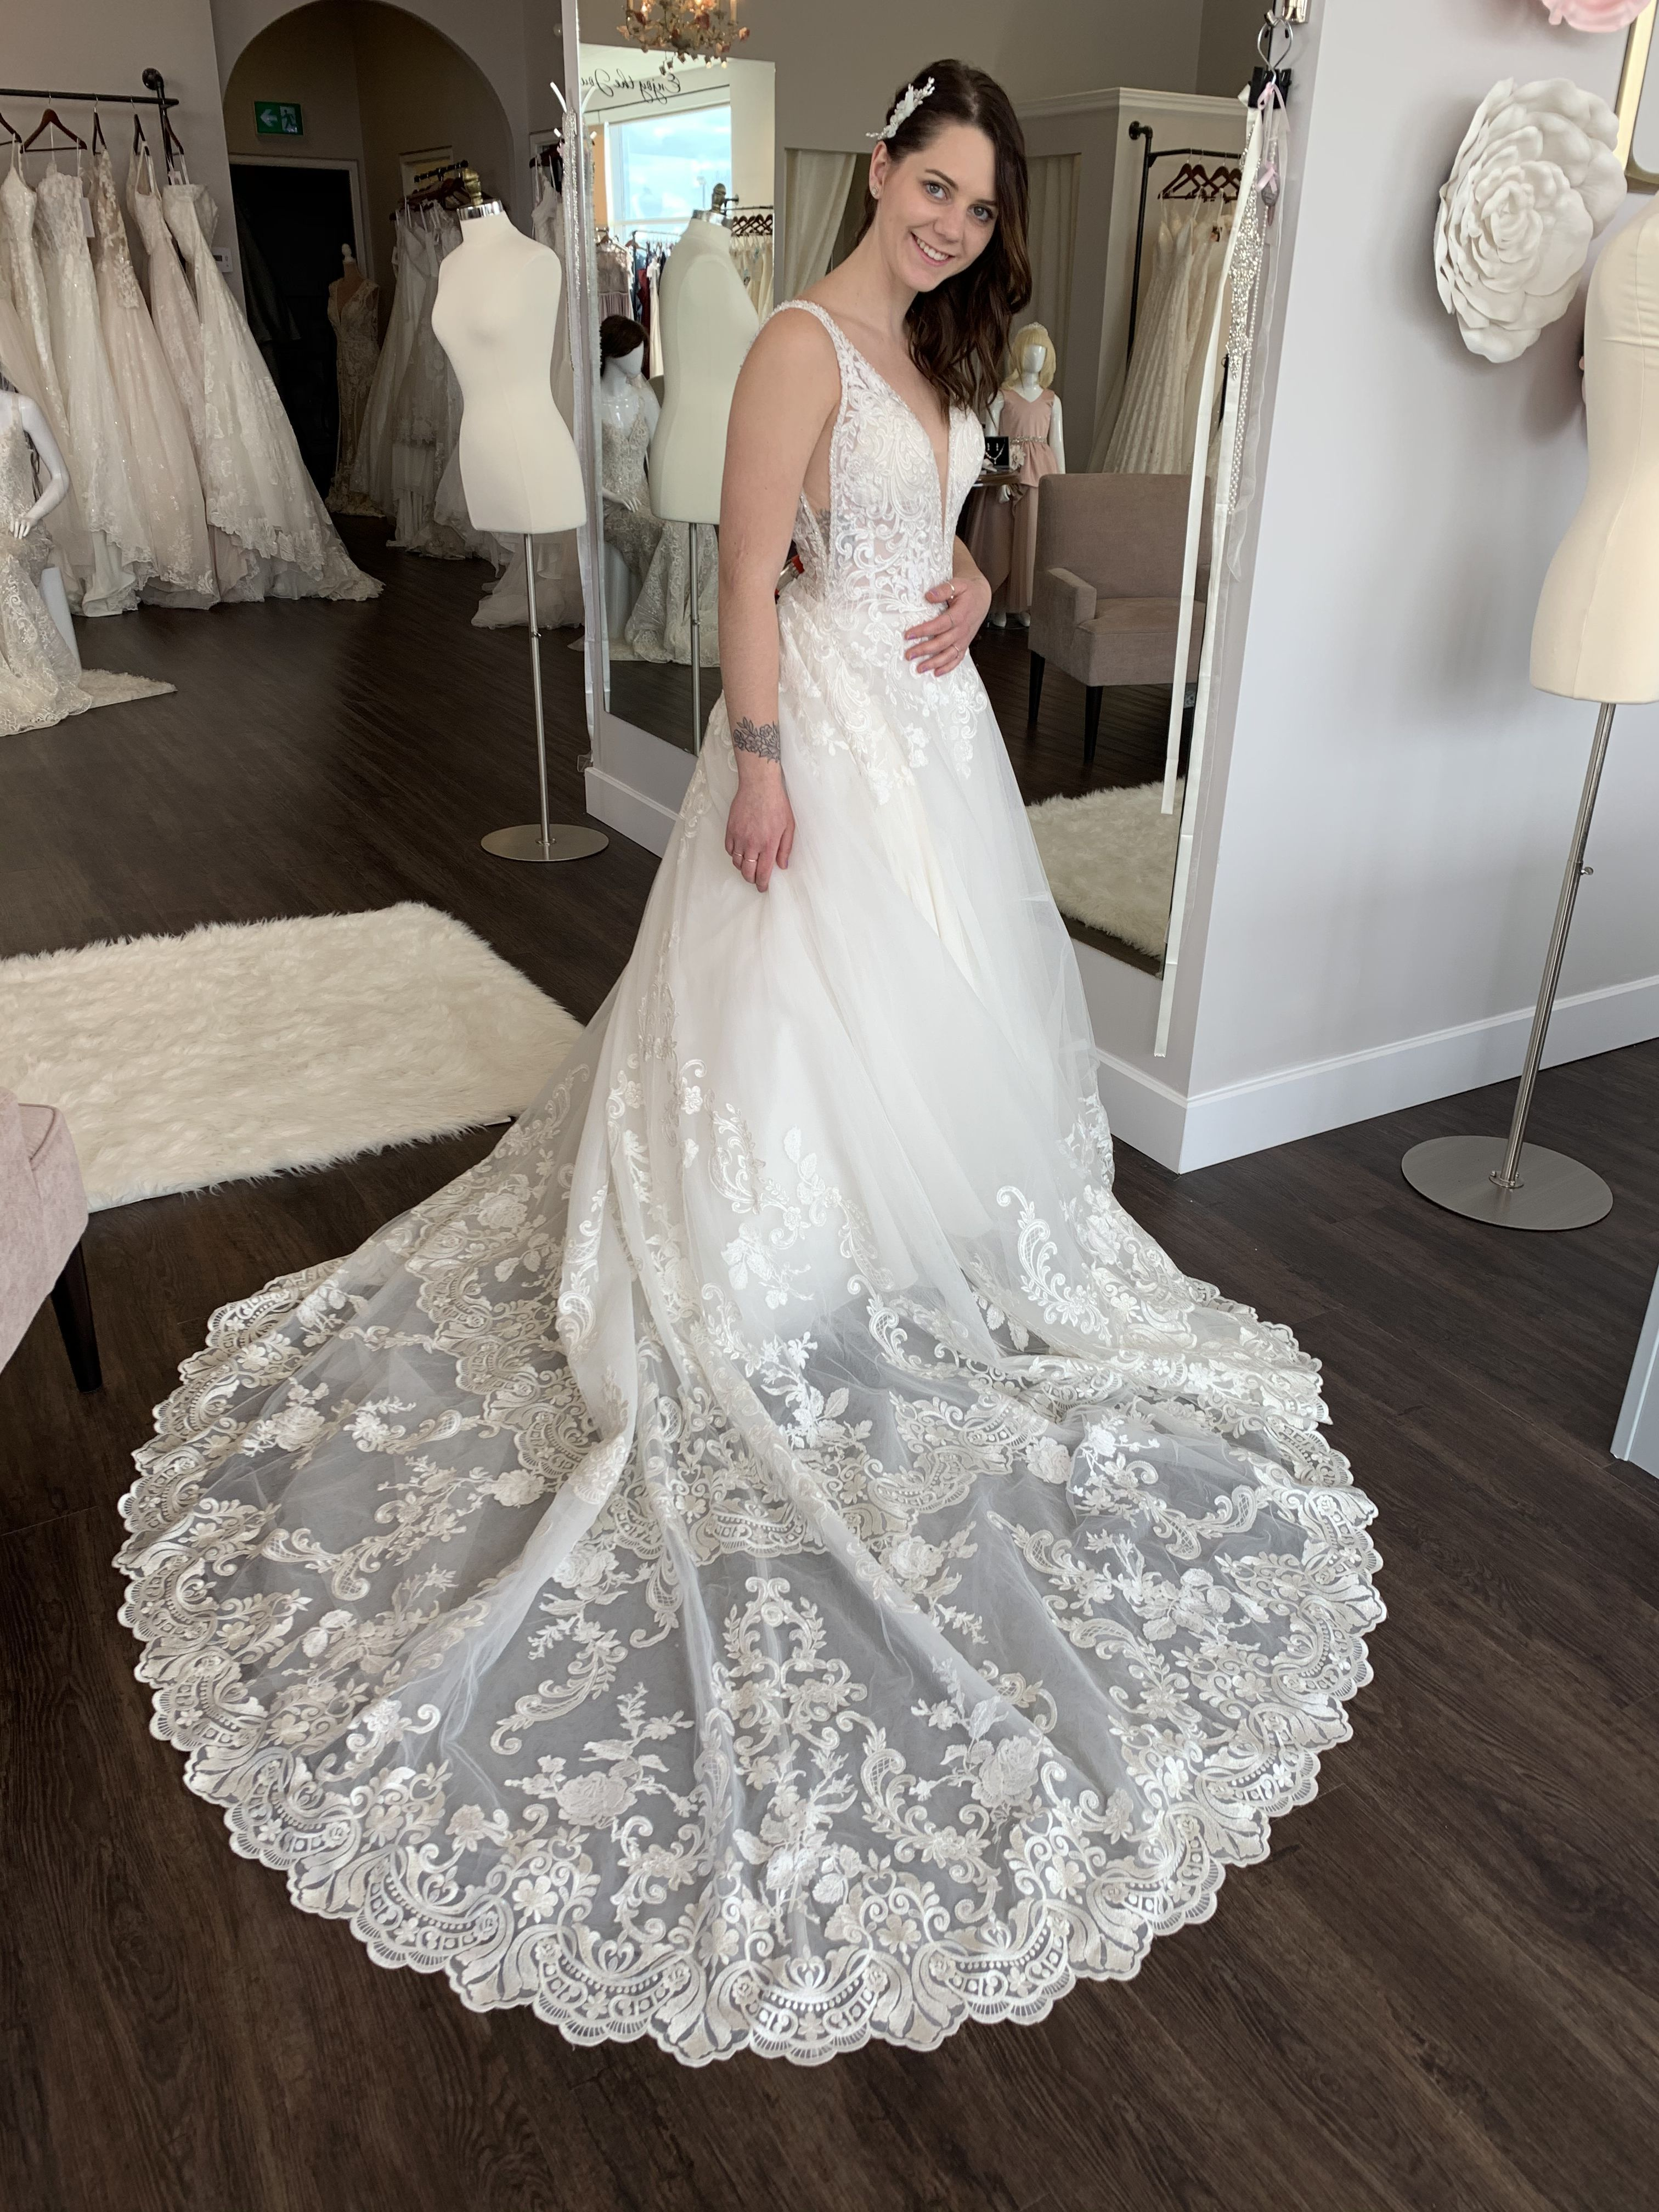 Wedding Dresses Lace Drop Waist Wedding Dresses Pink Wedding Dresses Modest Wedding Dresses [ 4032 x 3024 Pixel ]